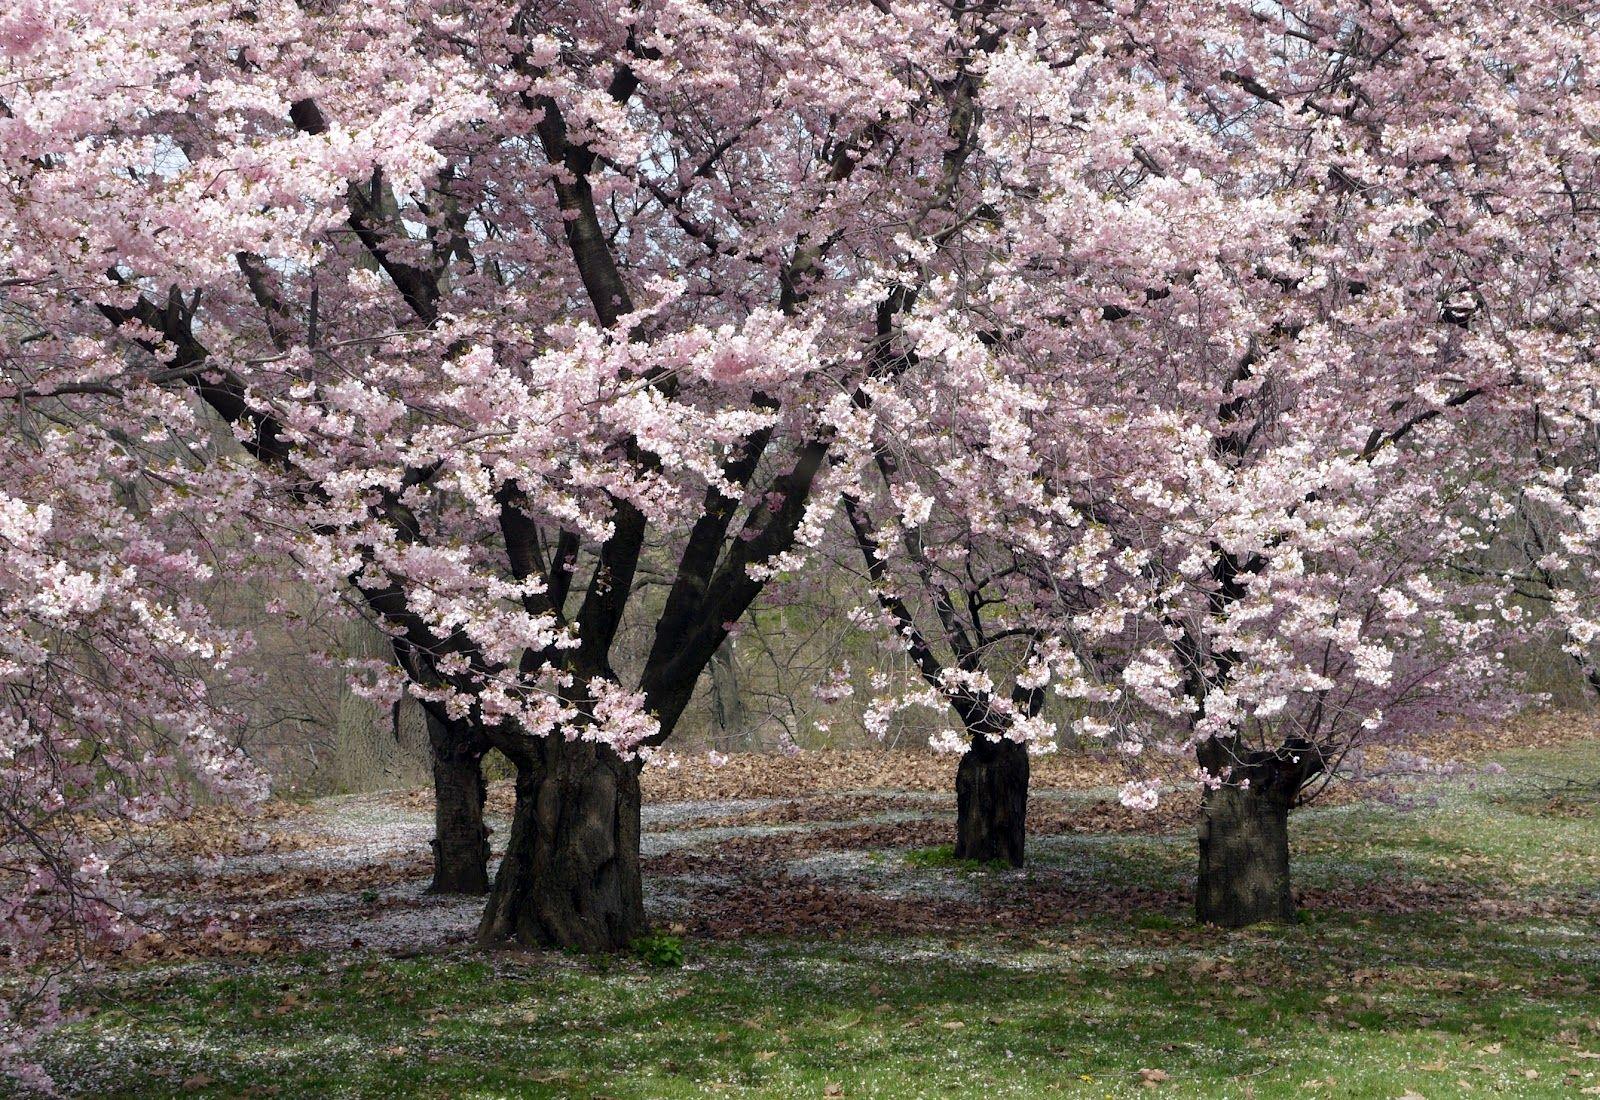 Sense and Simplicity: Cherry trees